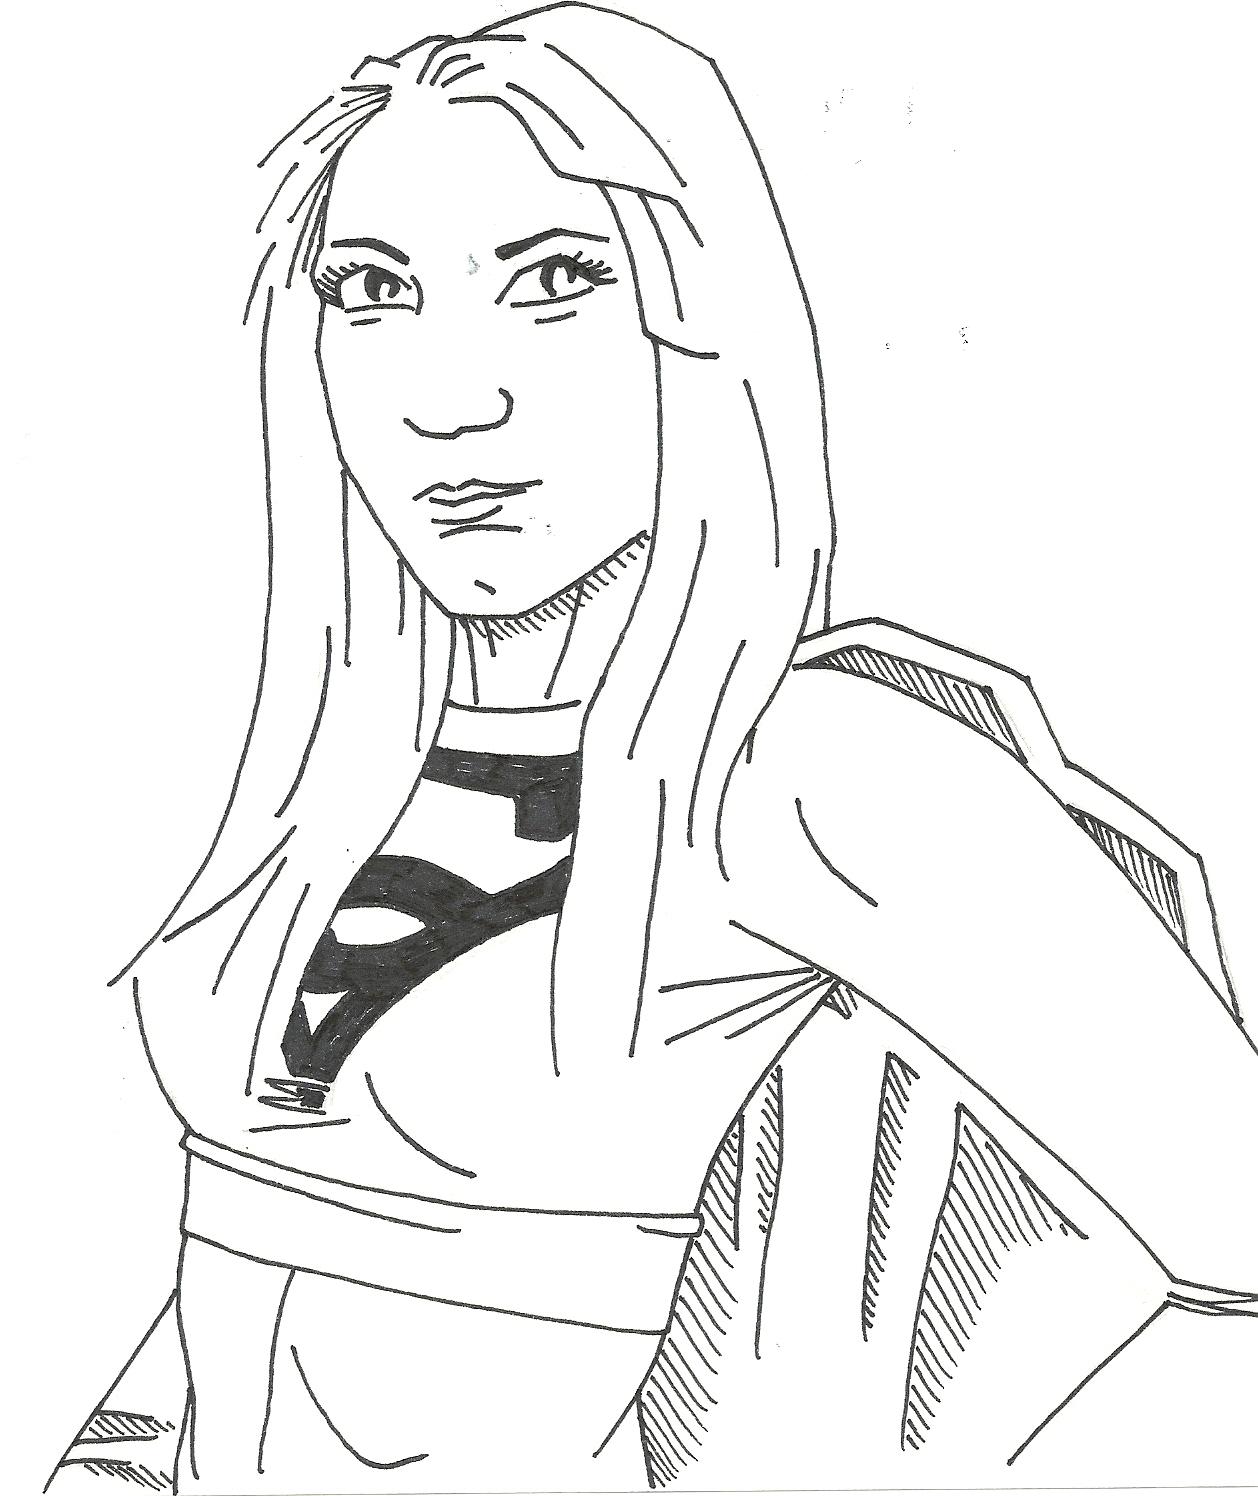 Supergirl Illustration #2